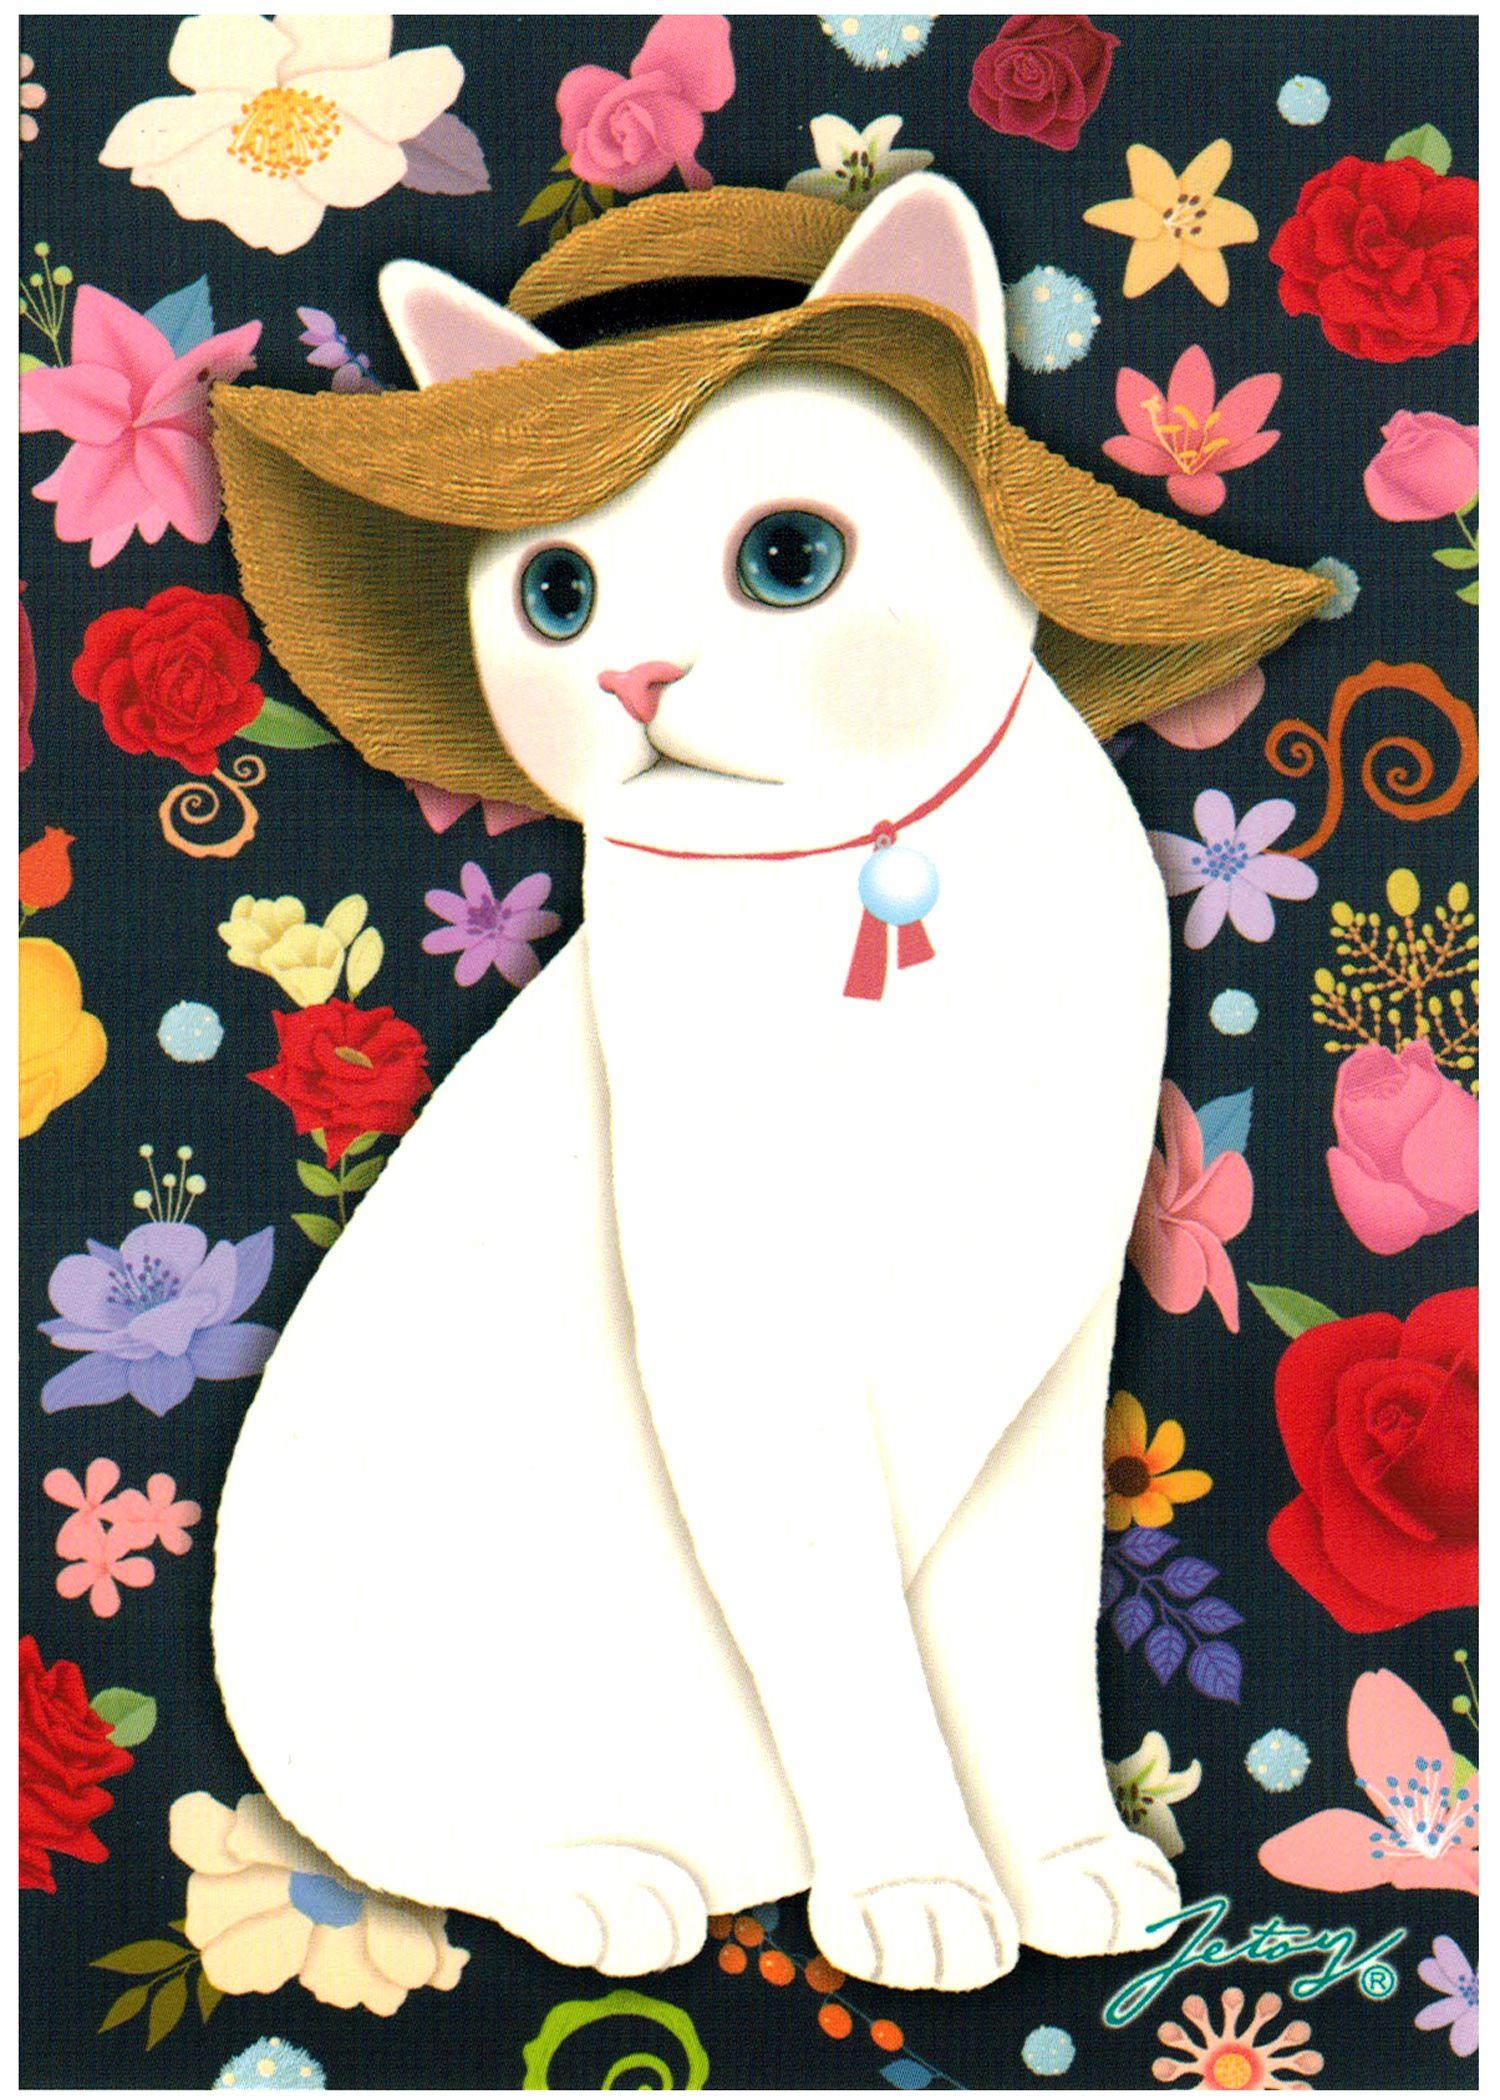 Jetoy Choo Choo Cat Postcard: Flower Garden